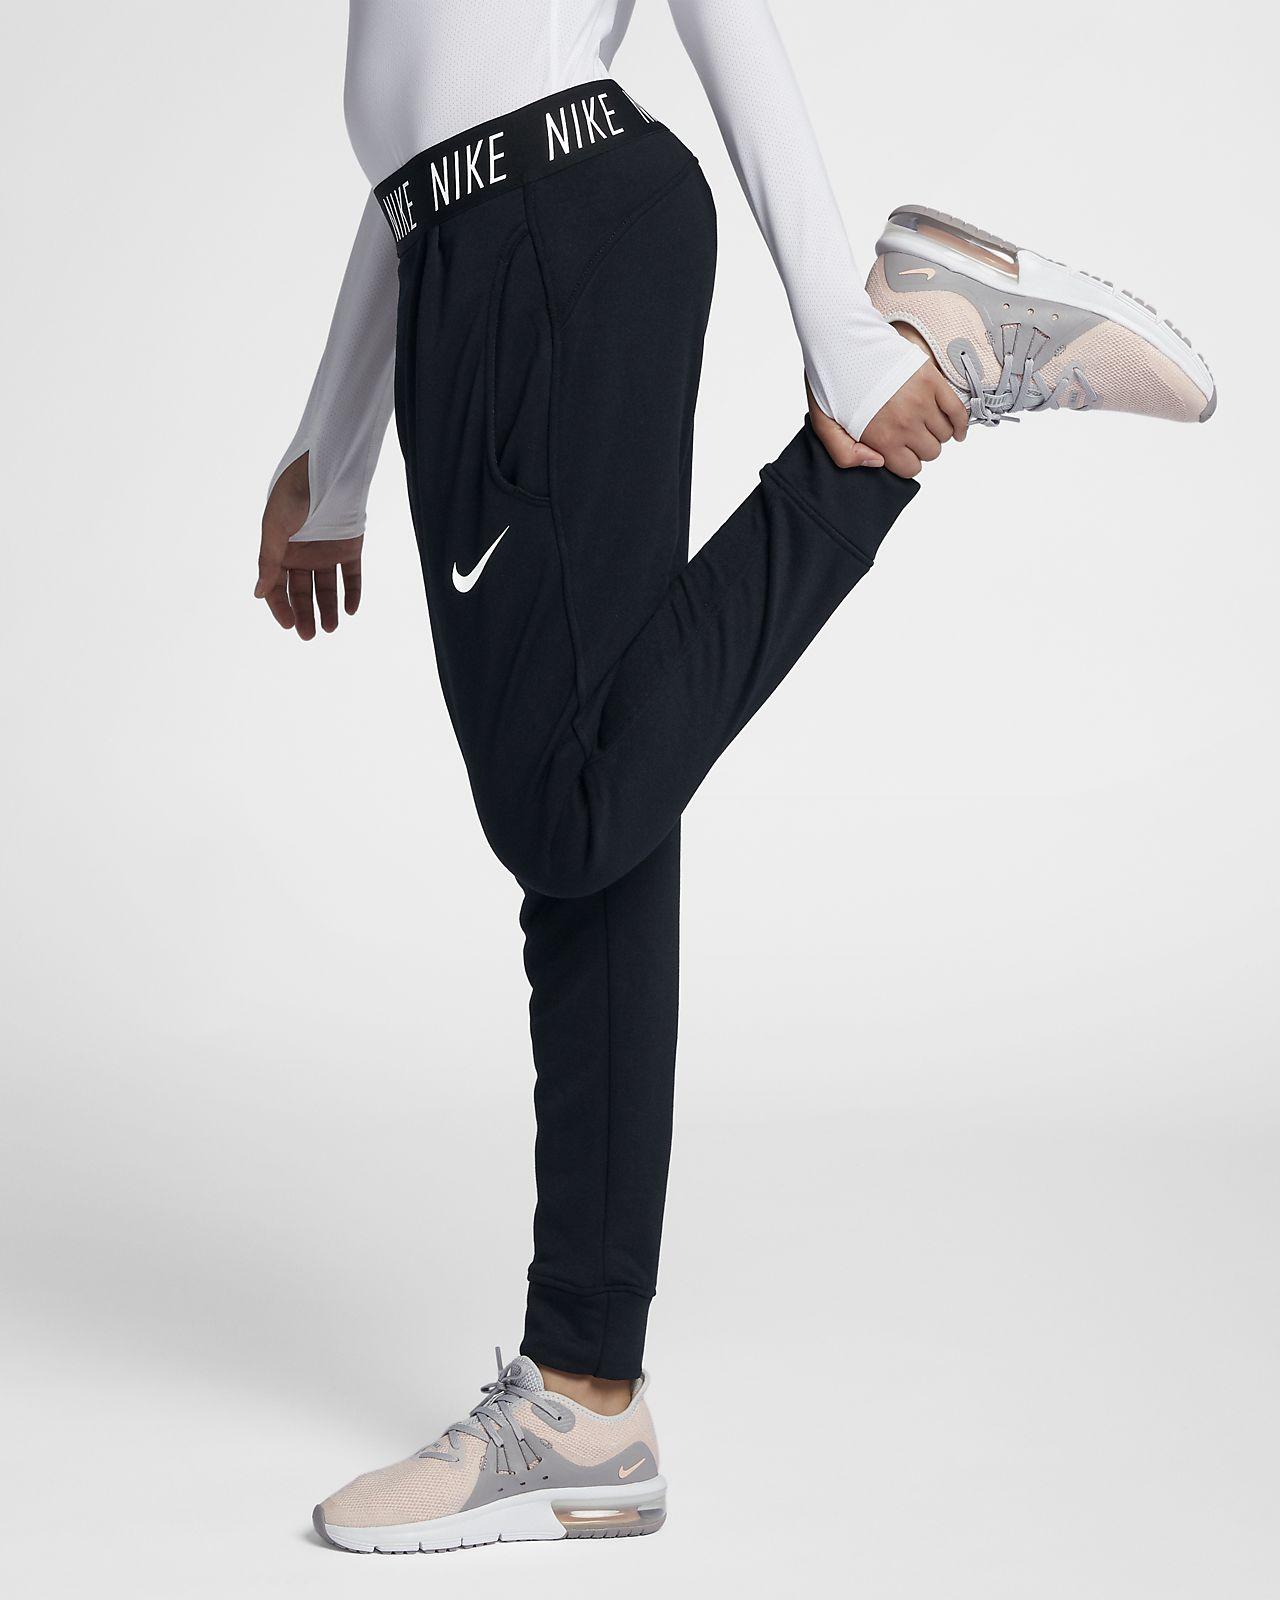 Pantalones de entrenamiento para niñas talla grande Nike Dri-FIT Core Studio 378c074356878